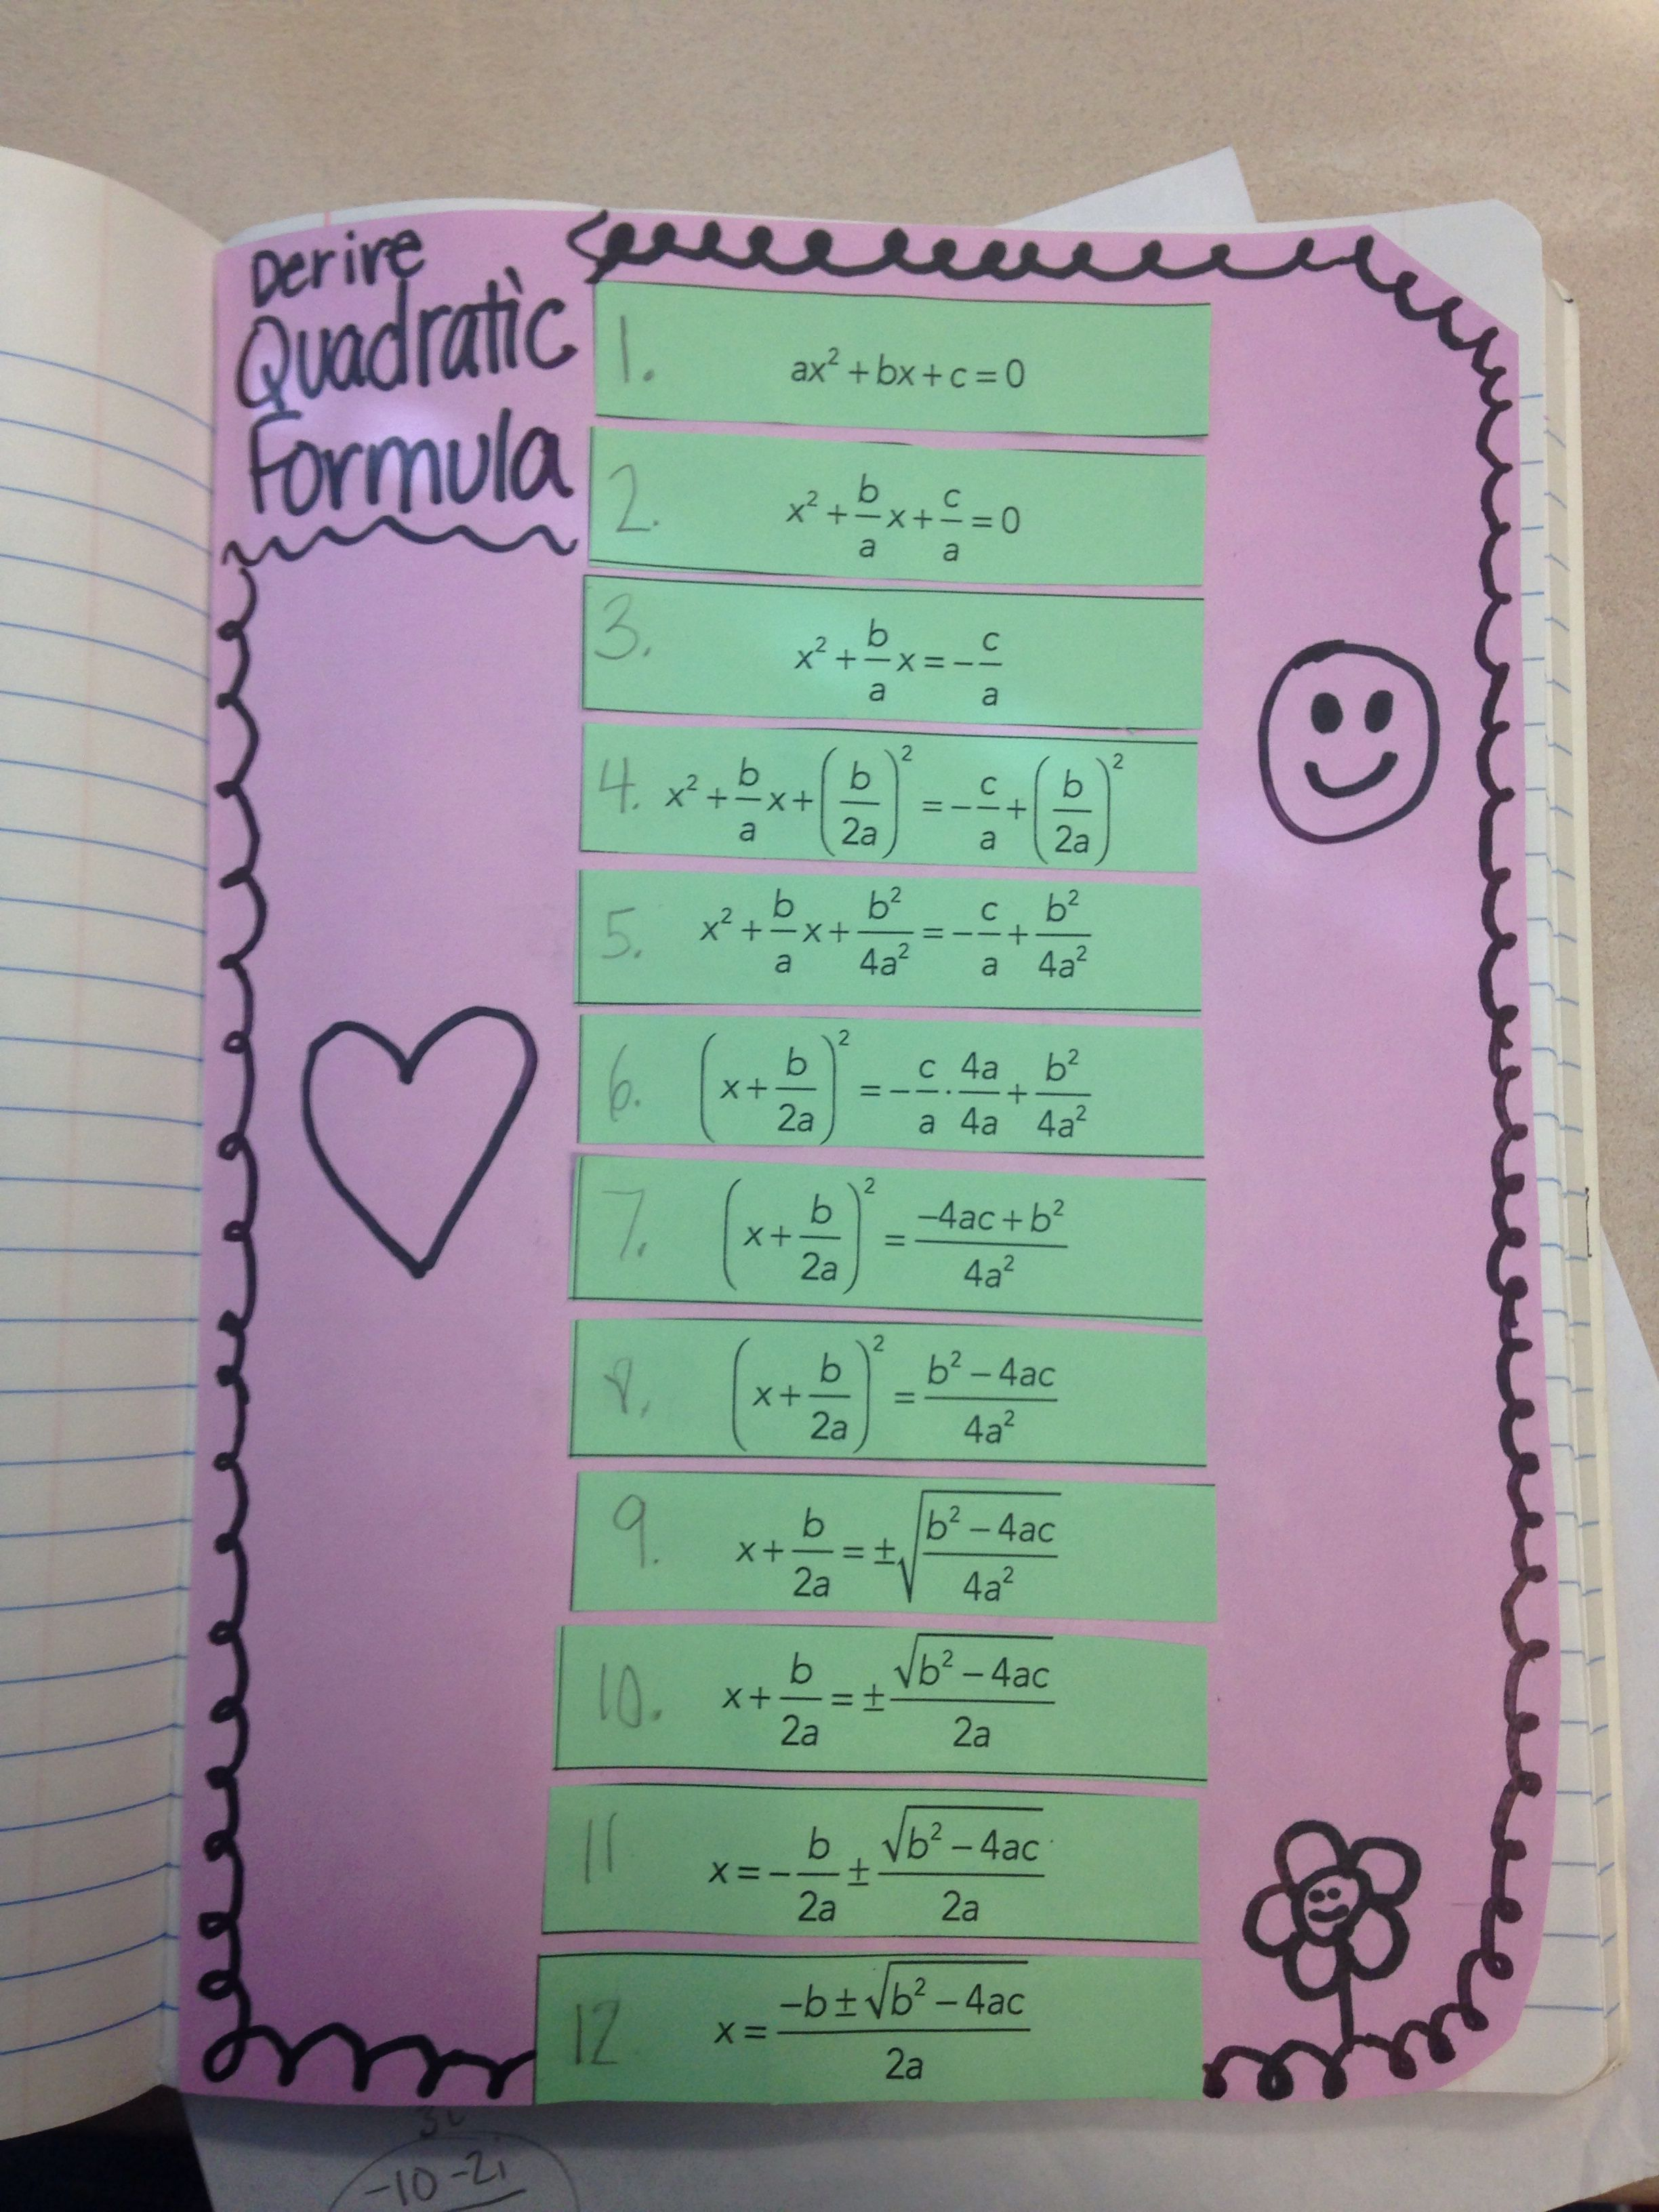 Cute Way To Derive The Quadratic Formula